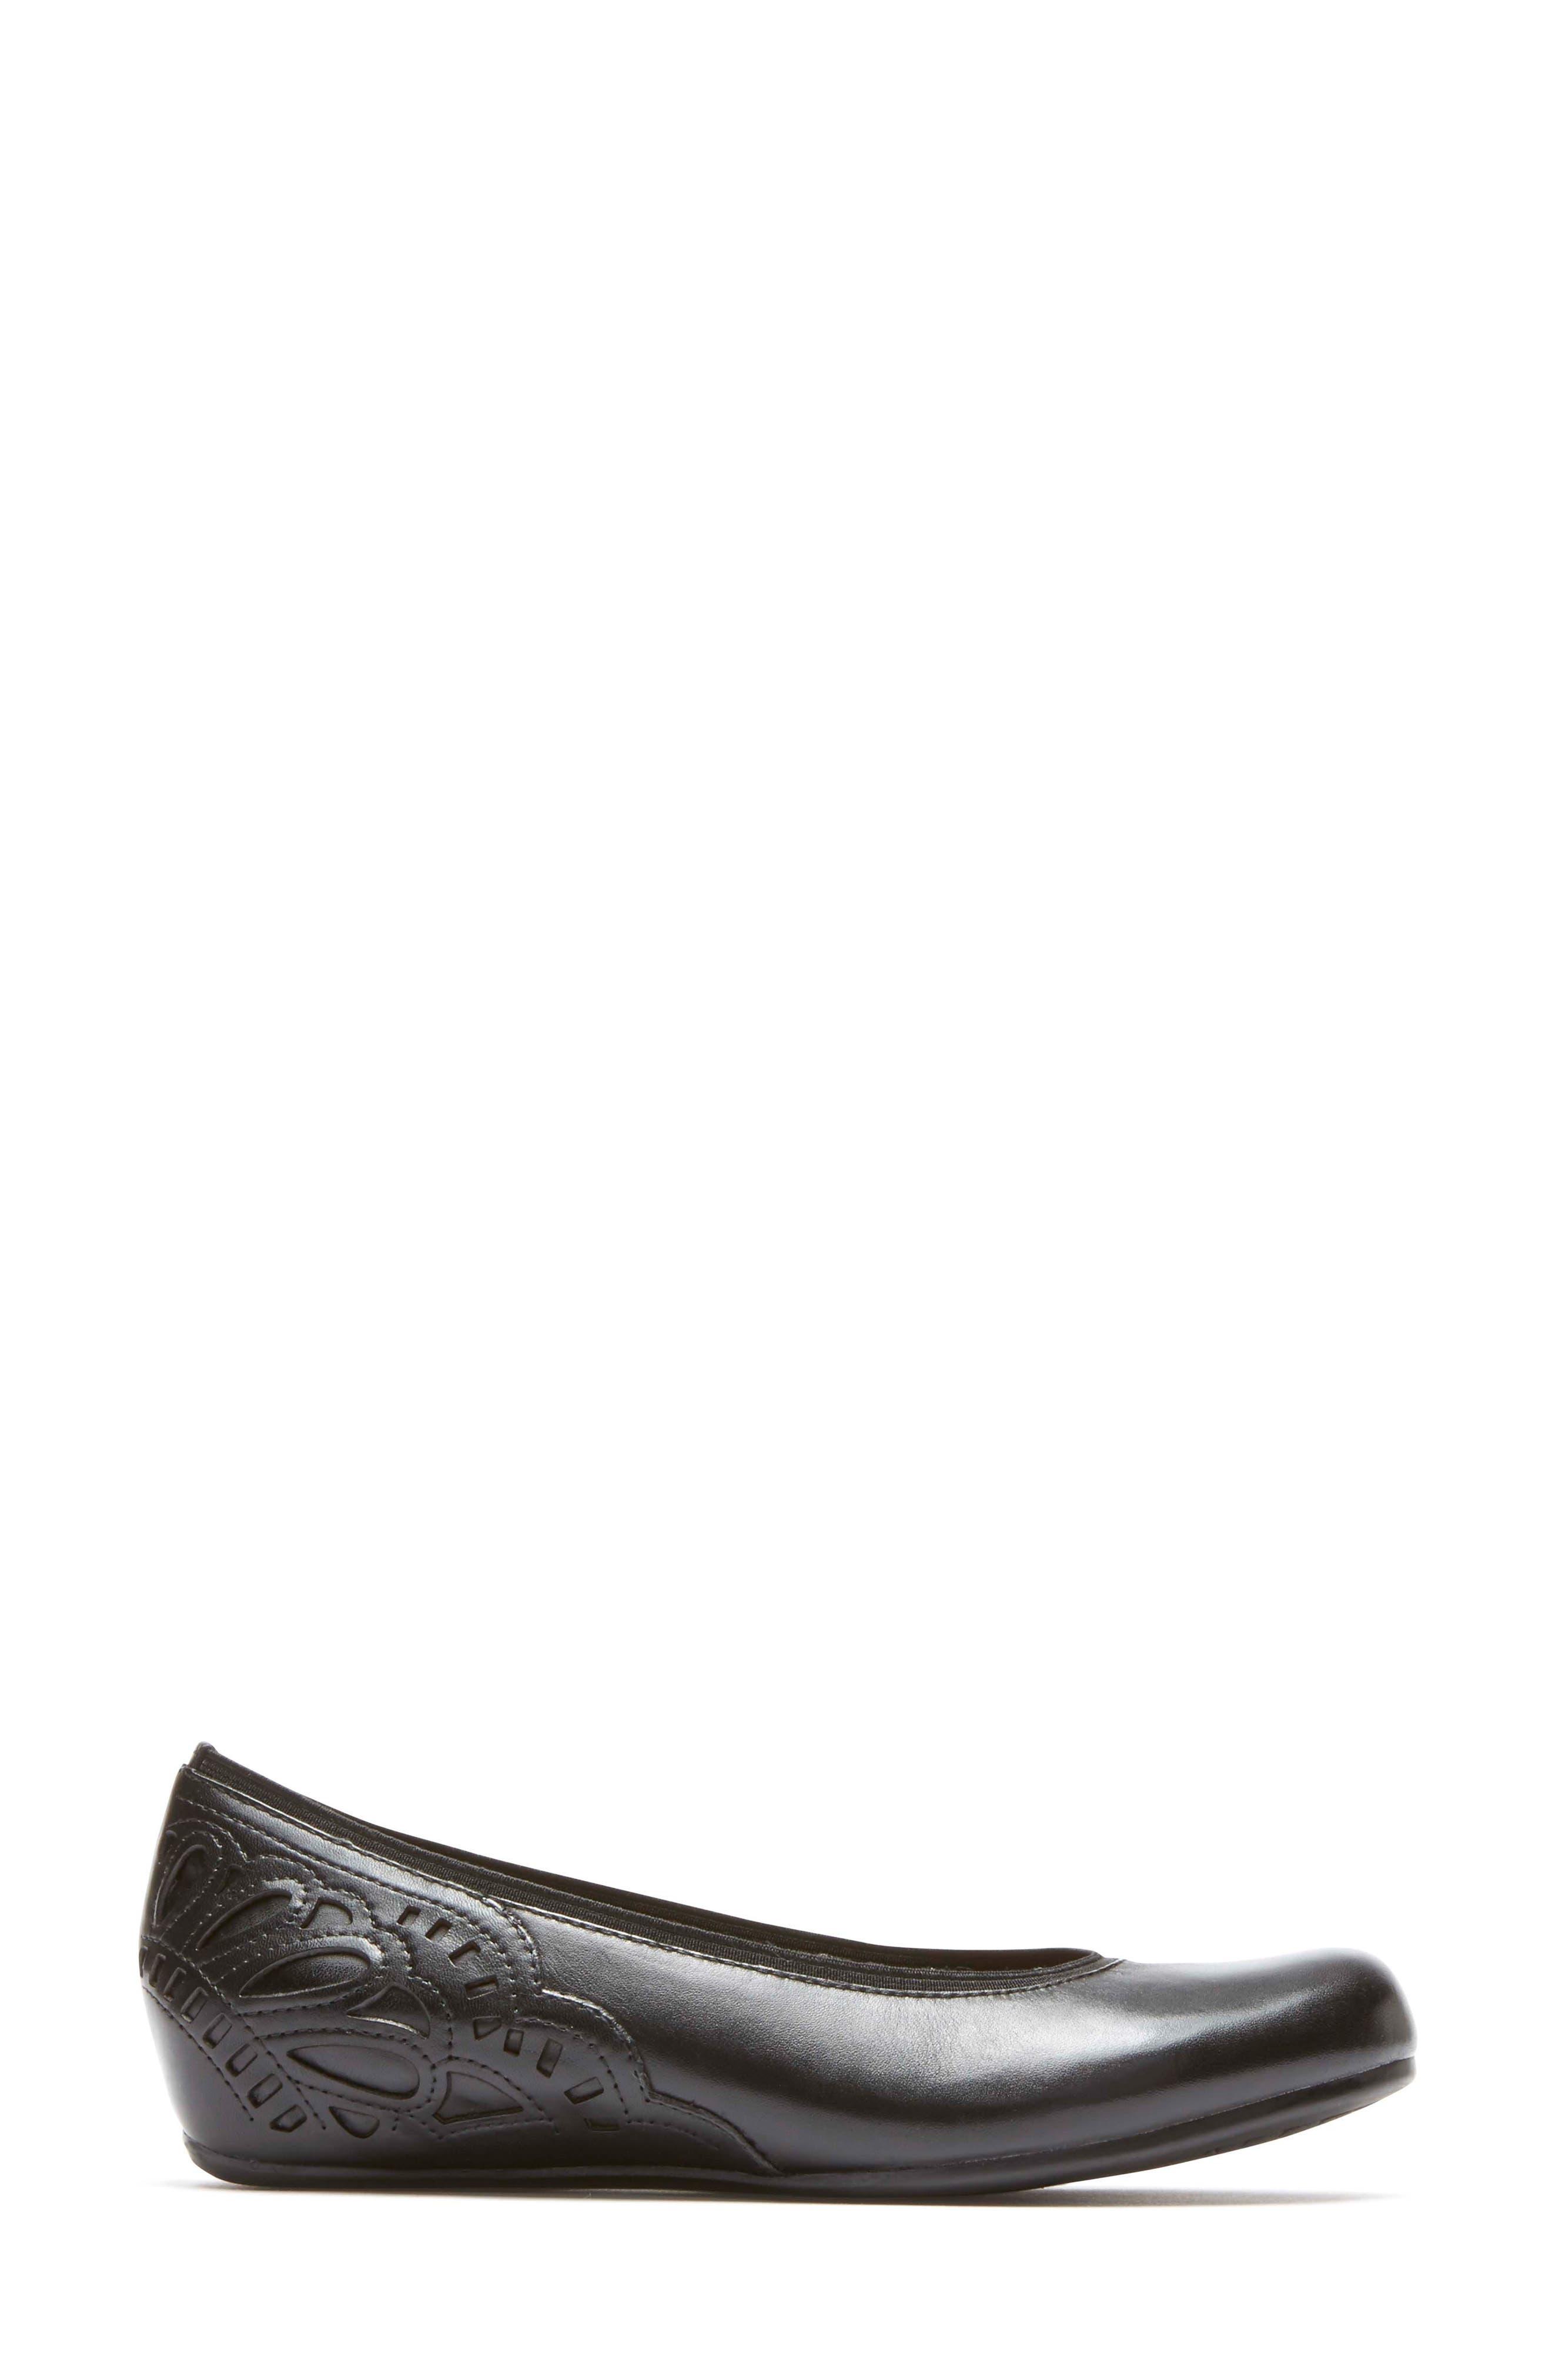 Sharleen Wedge Pump,                             Alternate thumbnail 3, color,                             Black Leather